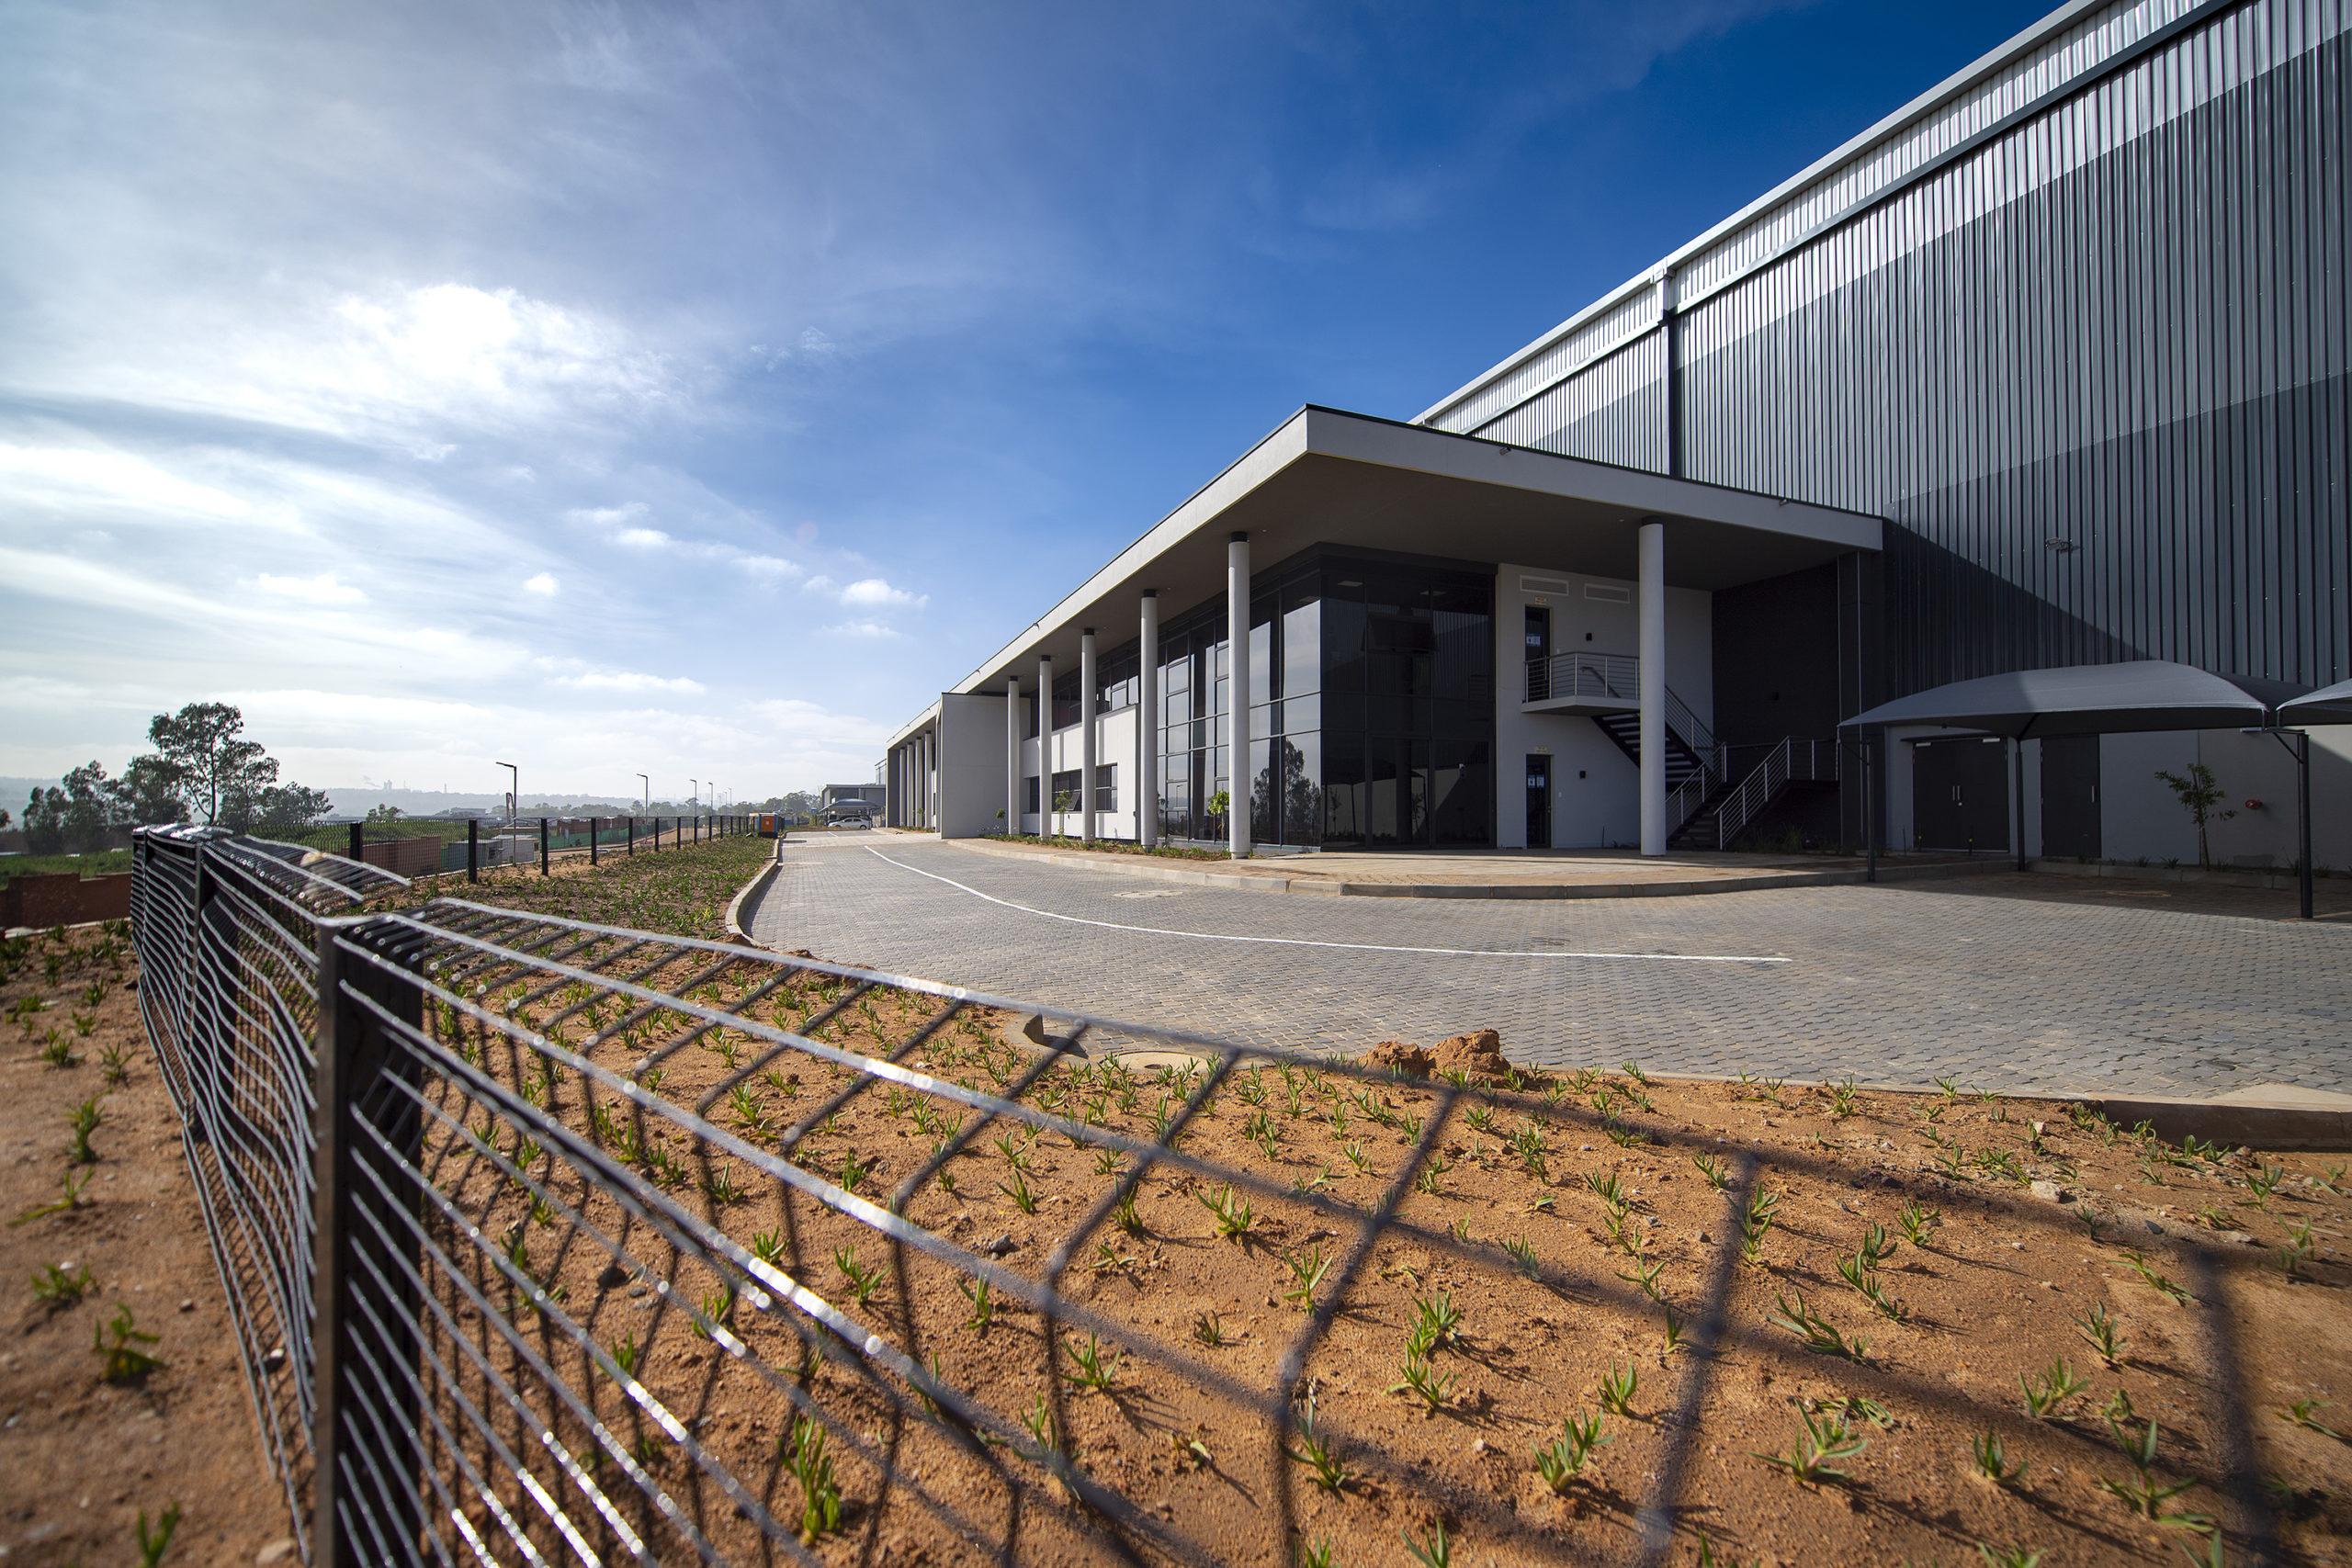 Fortress REIT – Longlake Logistics Park